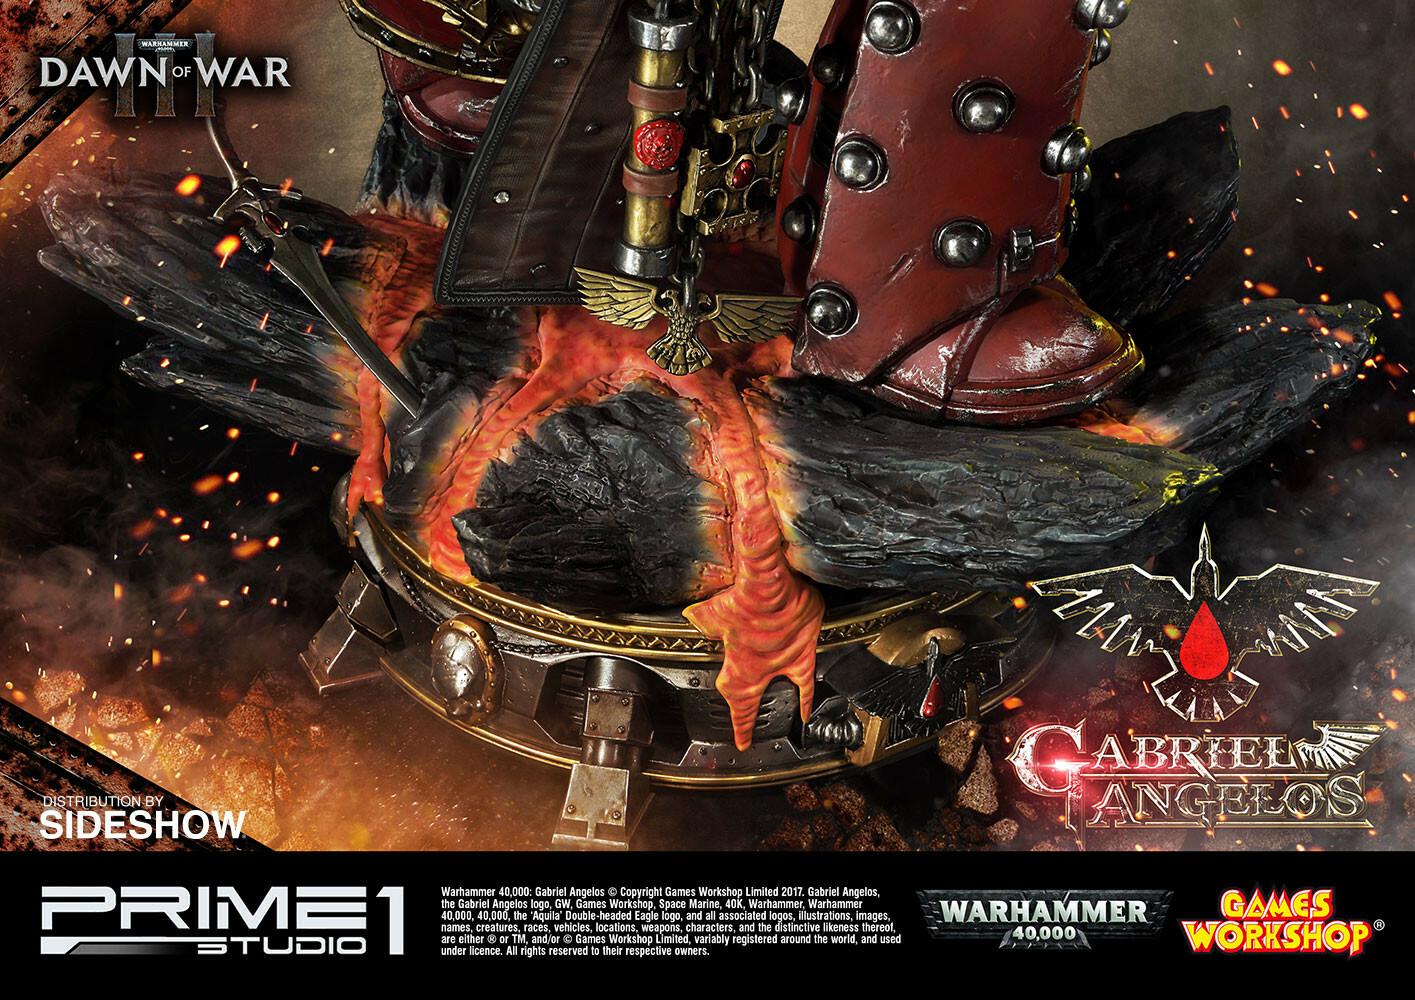 Jesse sandifer jesse sandifer warhammer dawn of war 3 gabriel angelos statue prime1 studio 903165 37